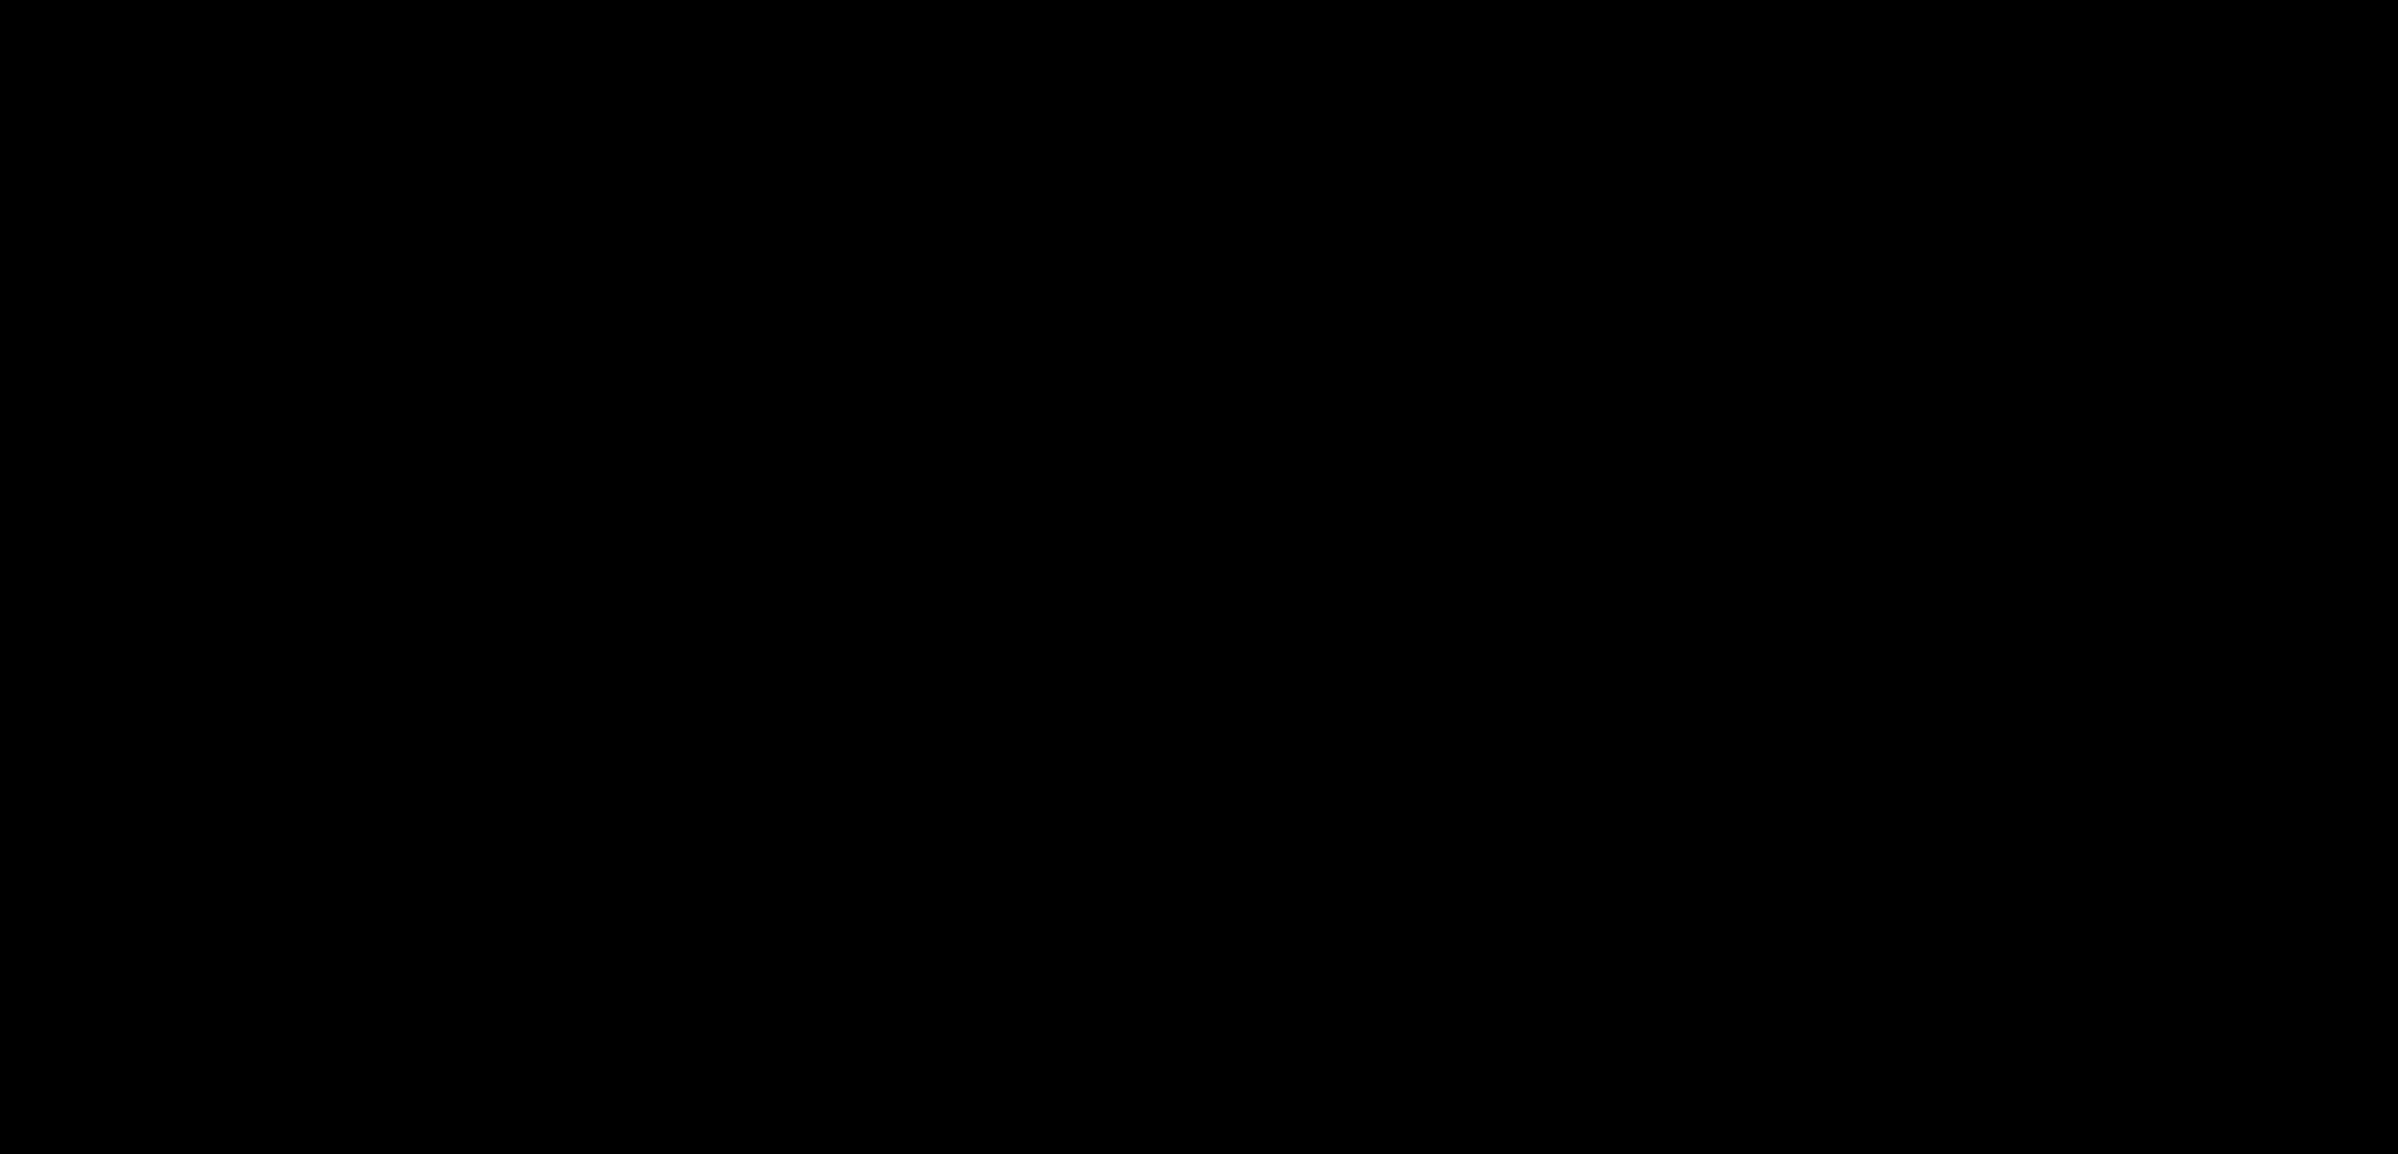 2398x1154 Leopard Moth Vector Clipart Image